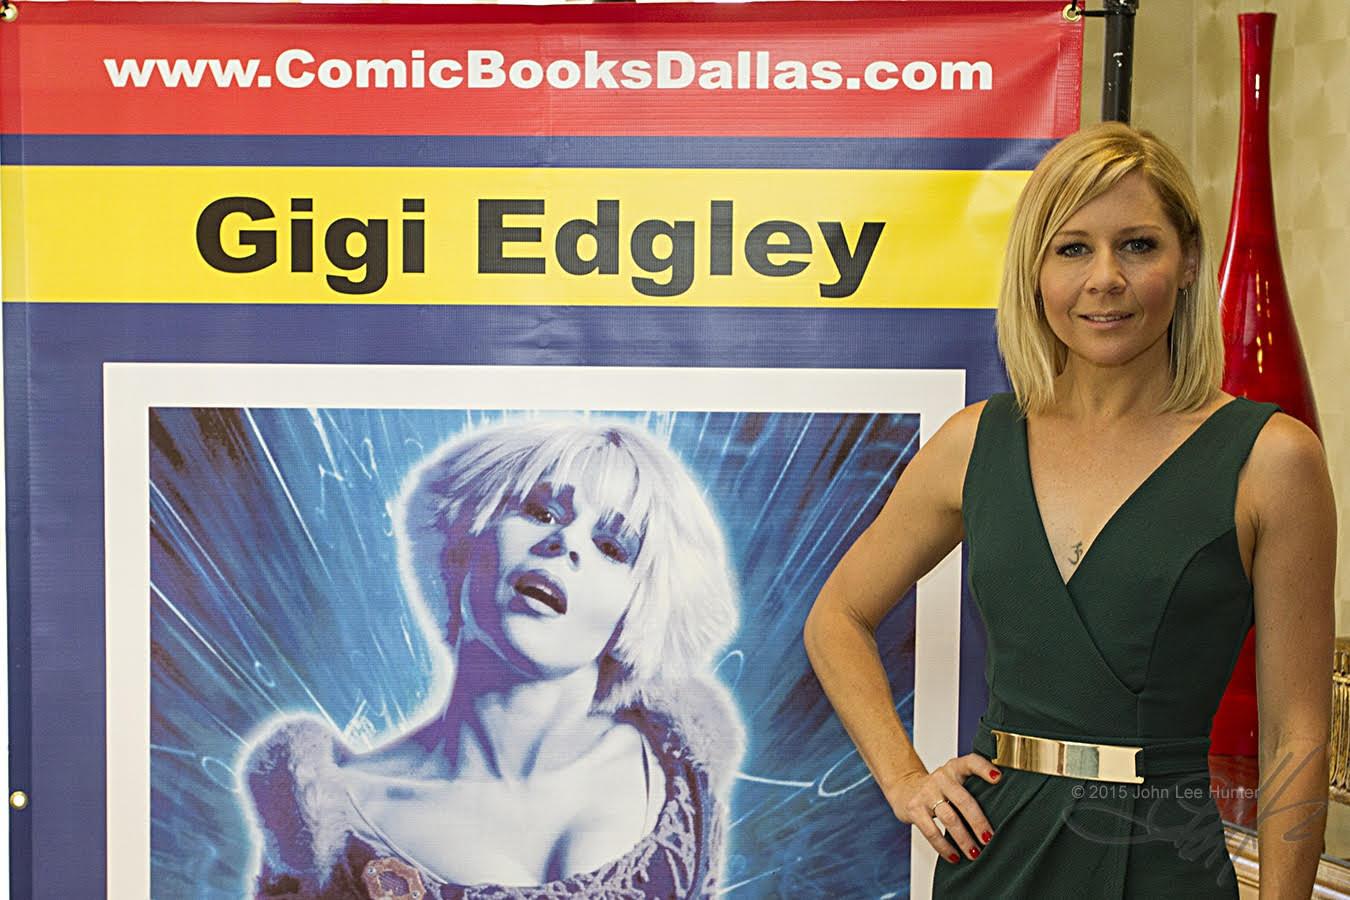 Gigi Edgley